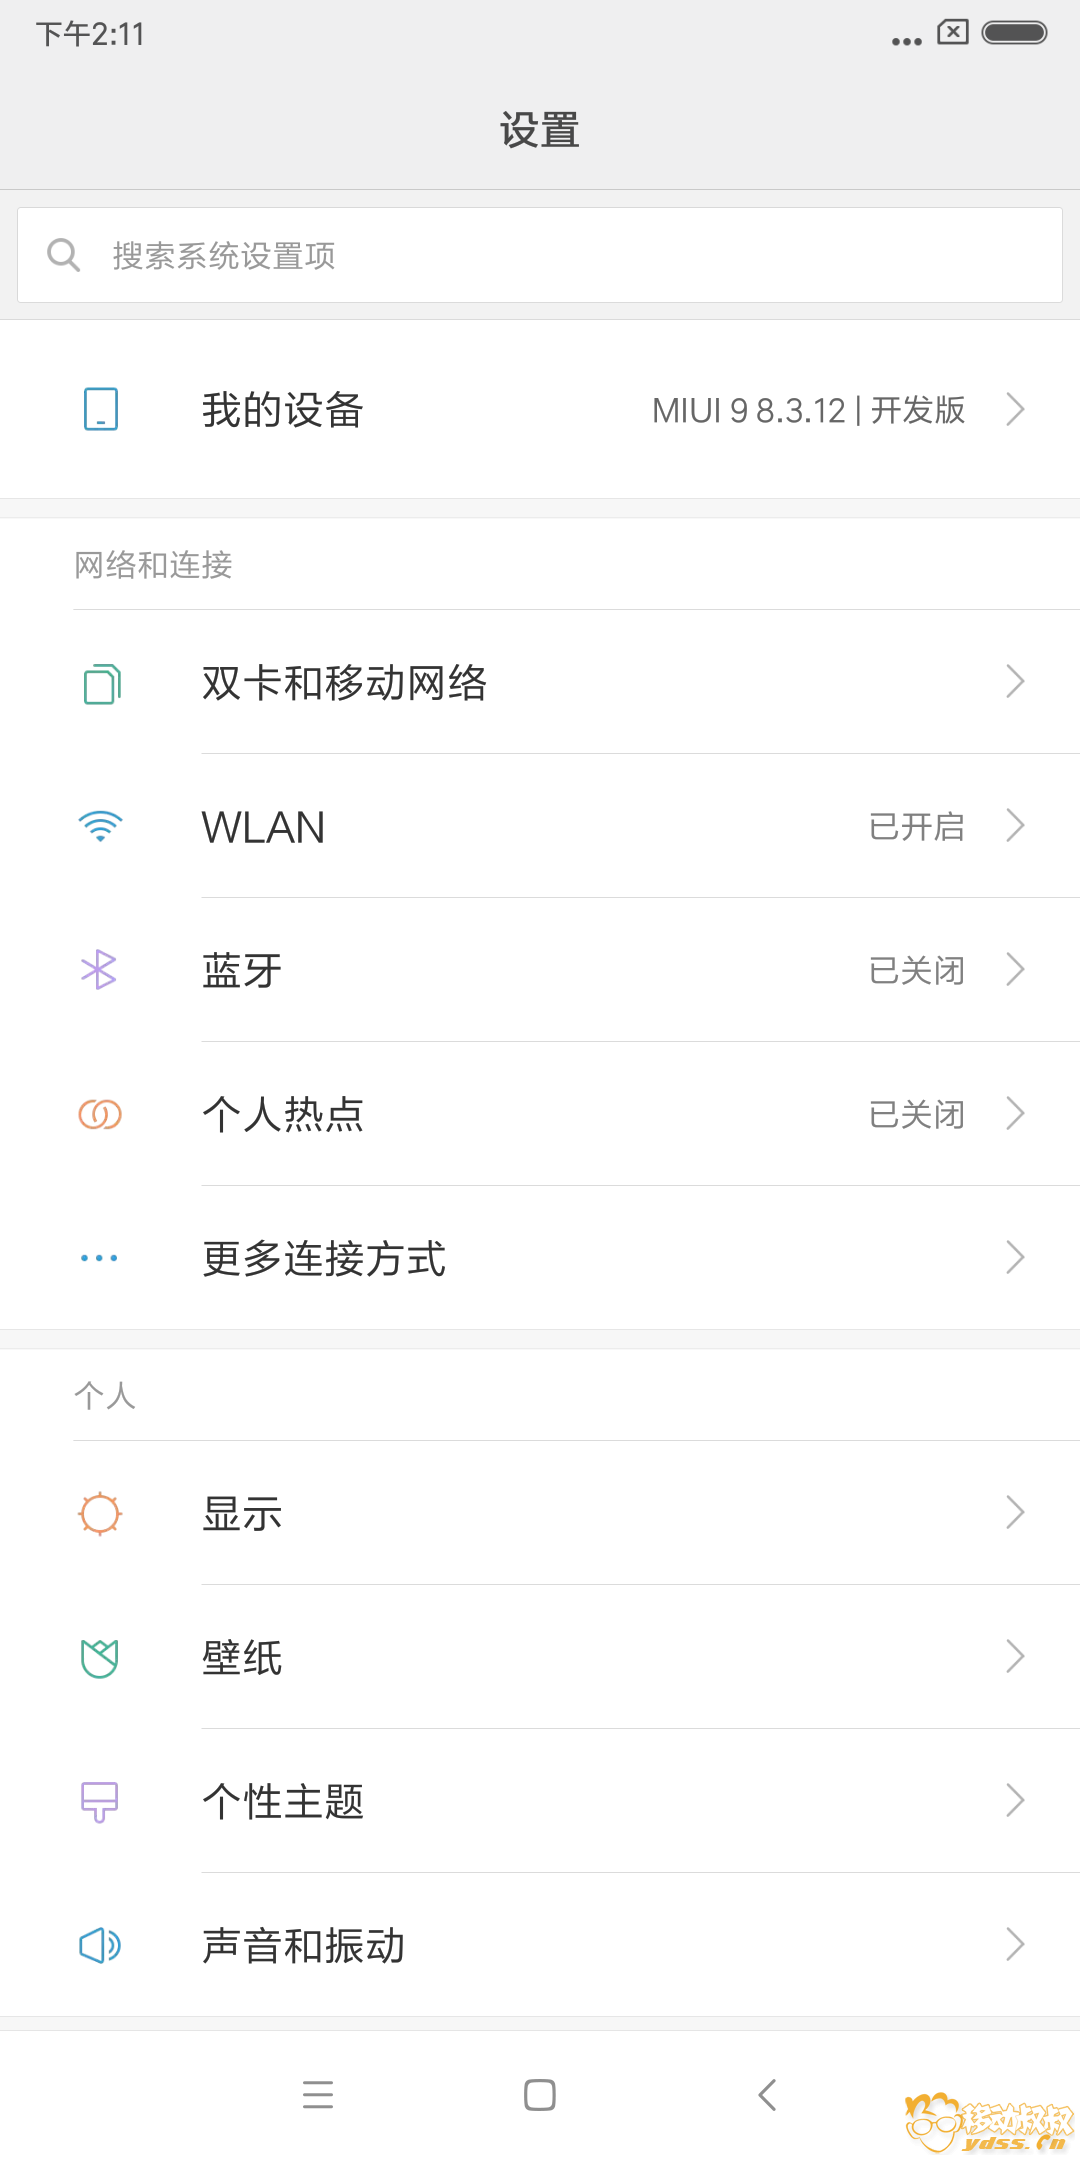 Screenshot_2018-03-12-14-11-27-839_com.android.settings.png